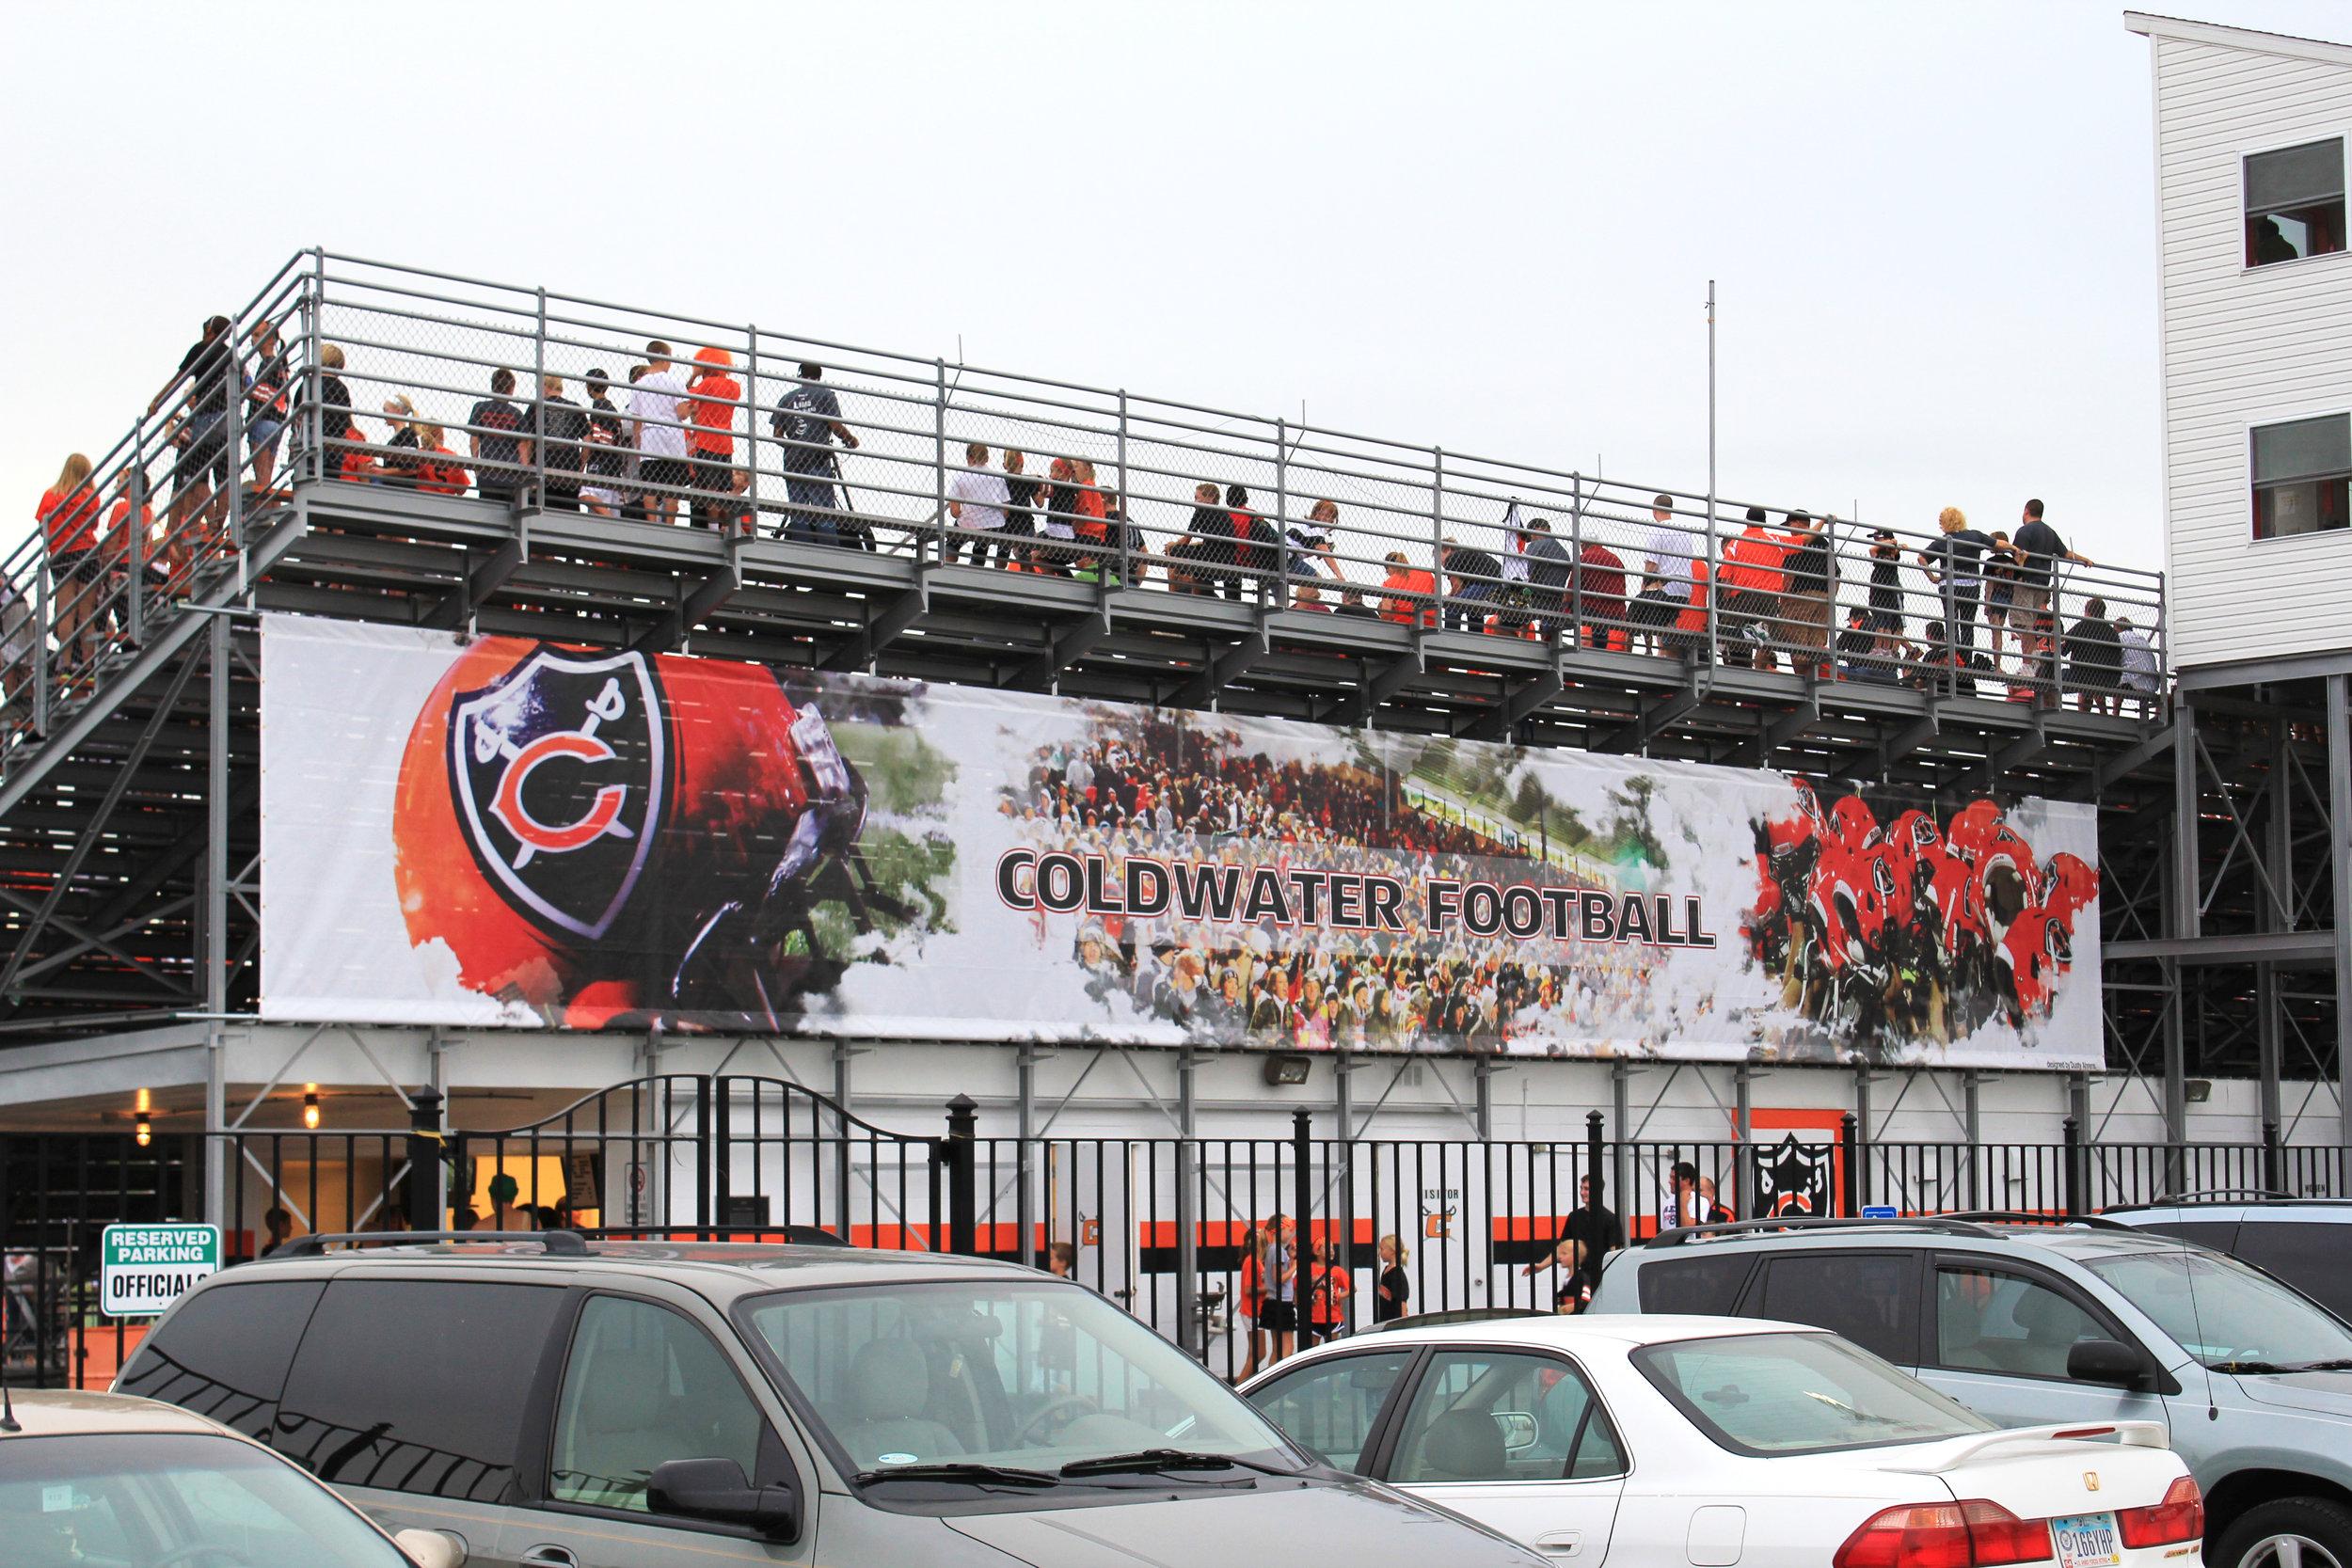 Coldwater Football Stadium Signs (44).JPG